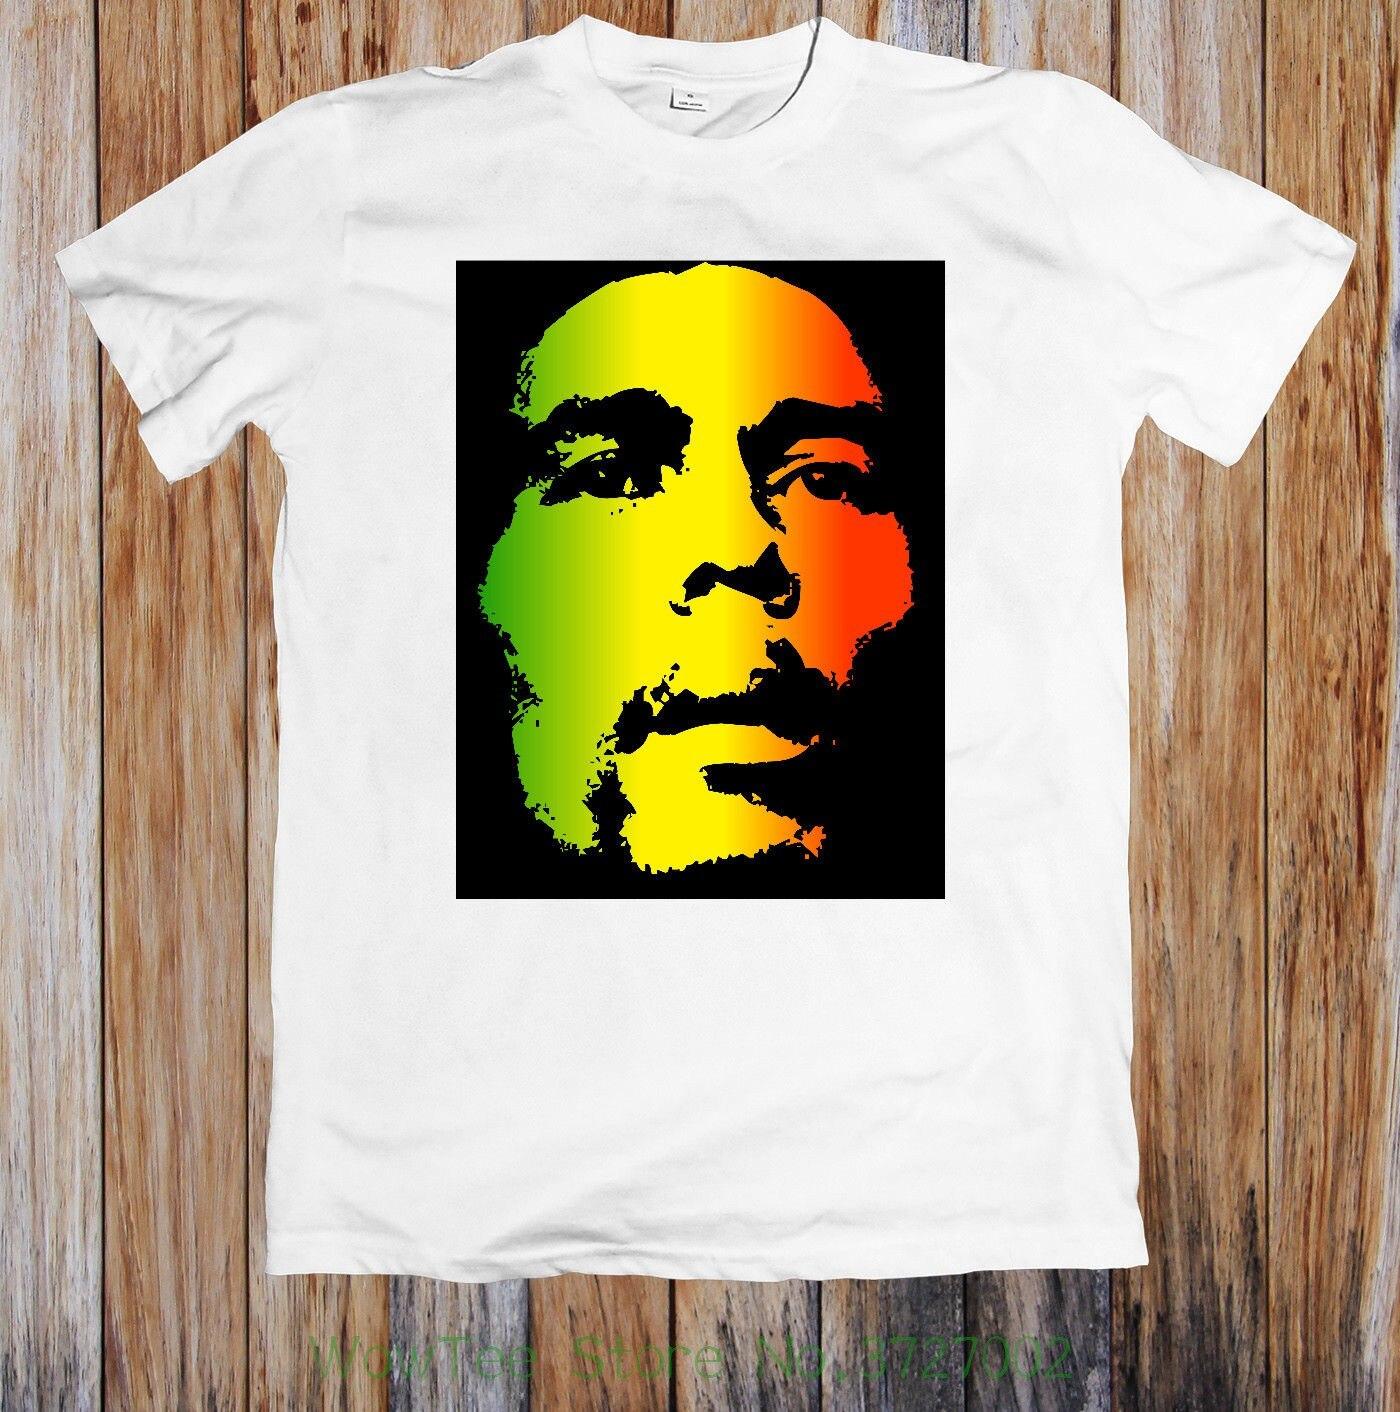 Bob Marley Unisex T-shirt 150 2018 Short Sleeve Cotton T Shirts Man Clothing Clear-Cut Texture T-shirts Men's Clothing